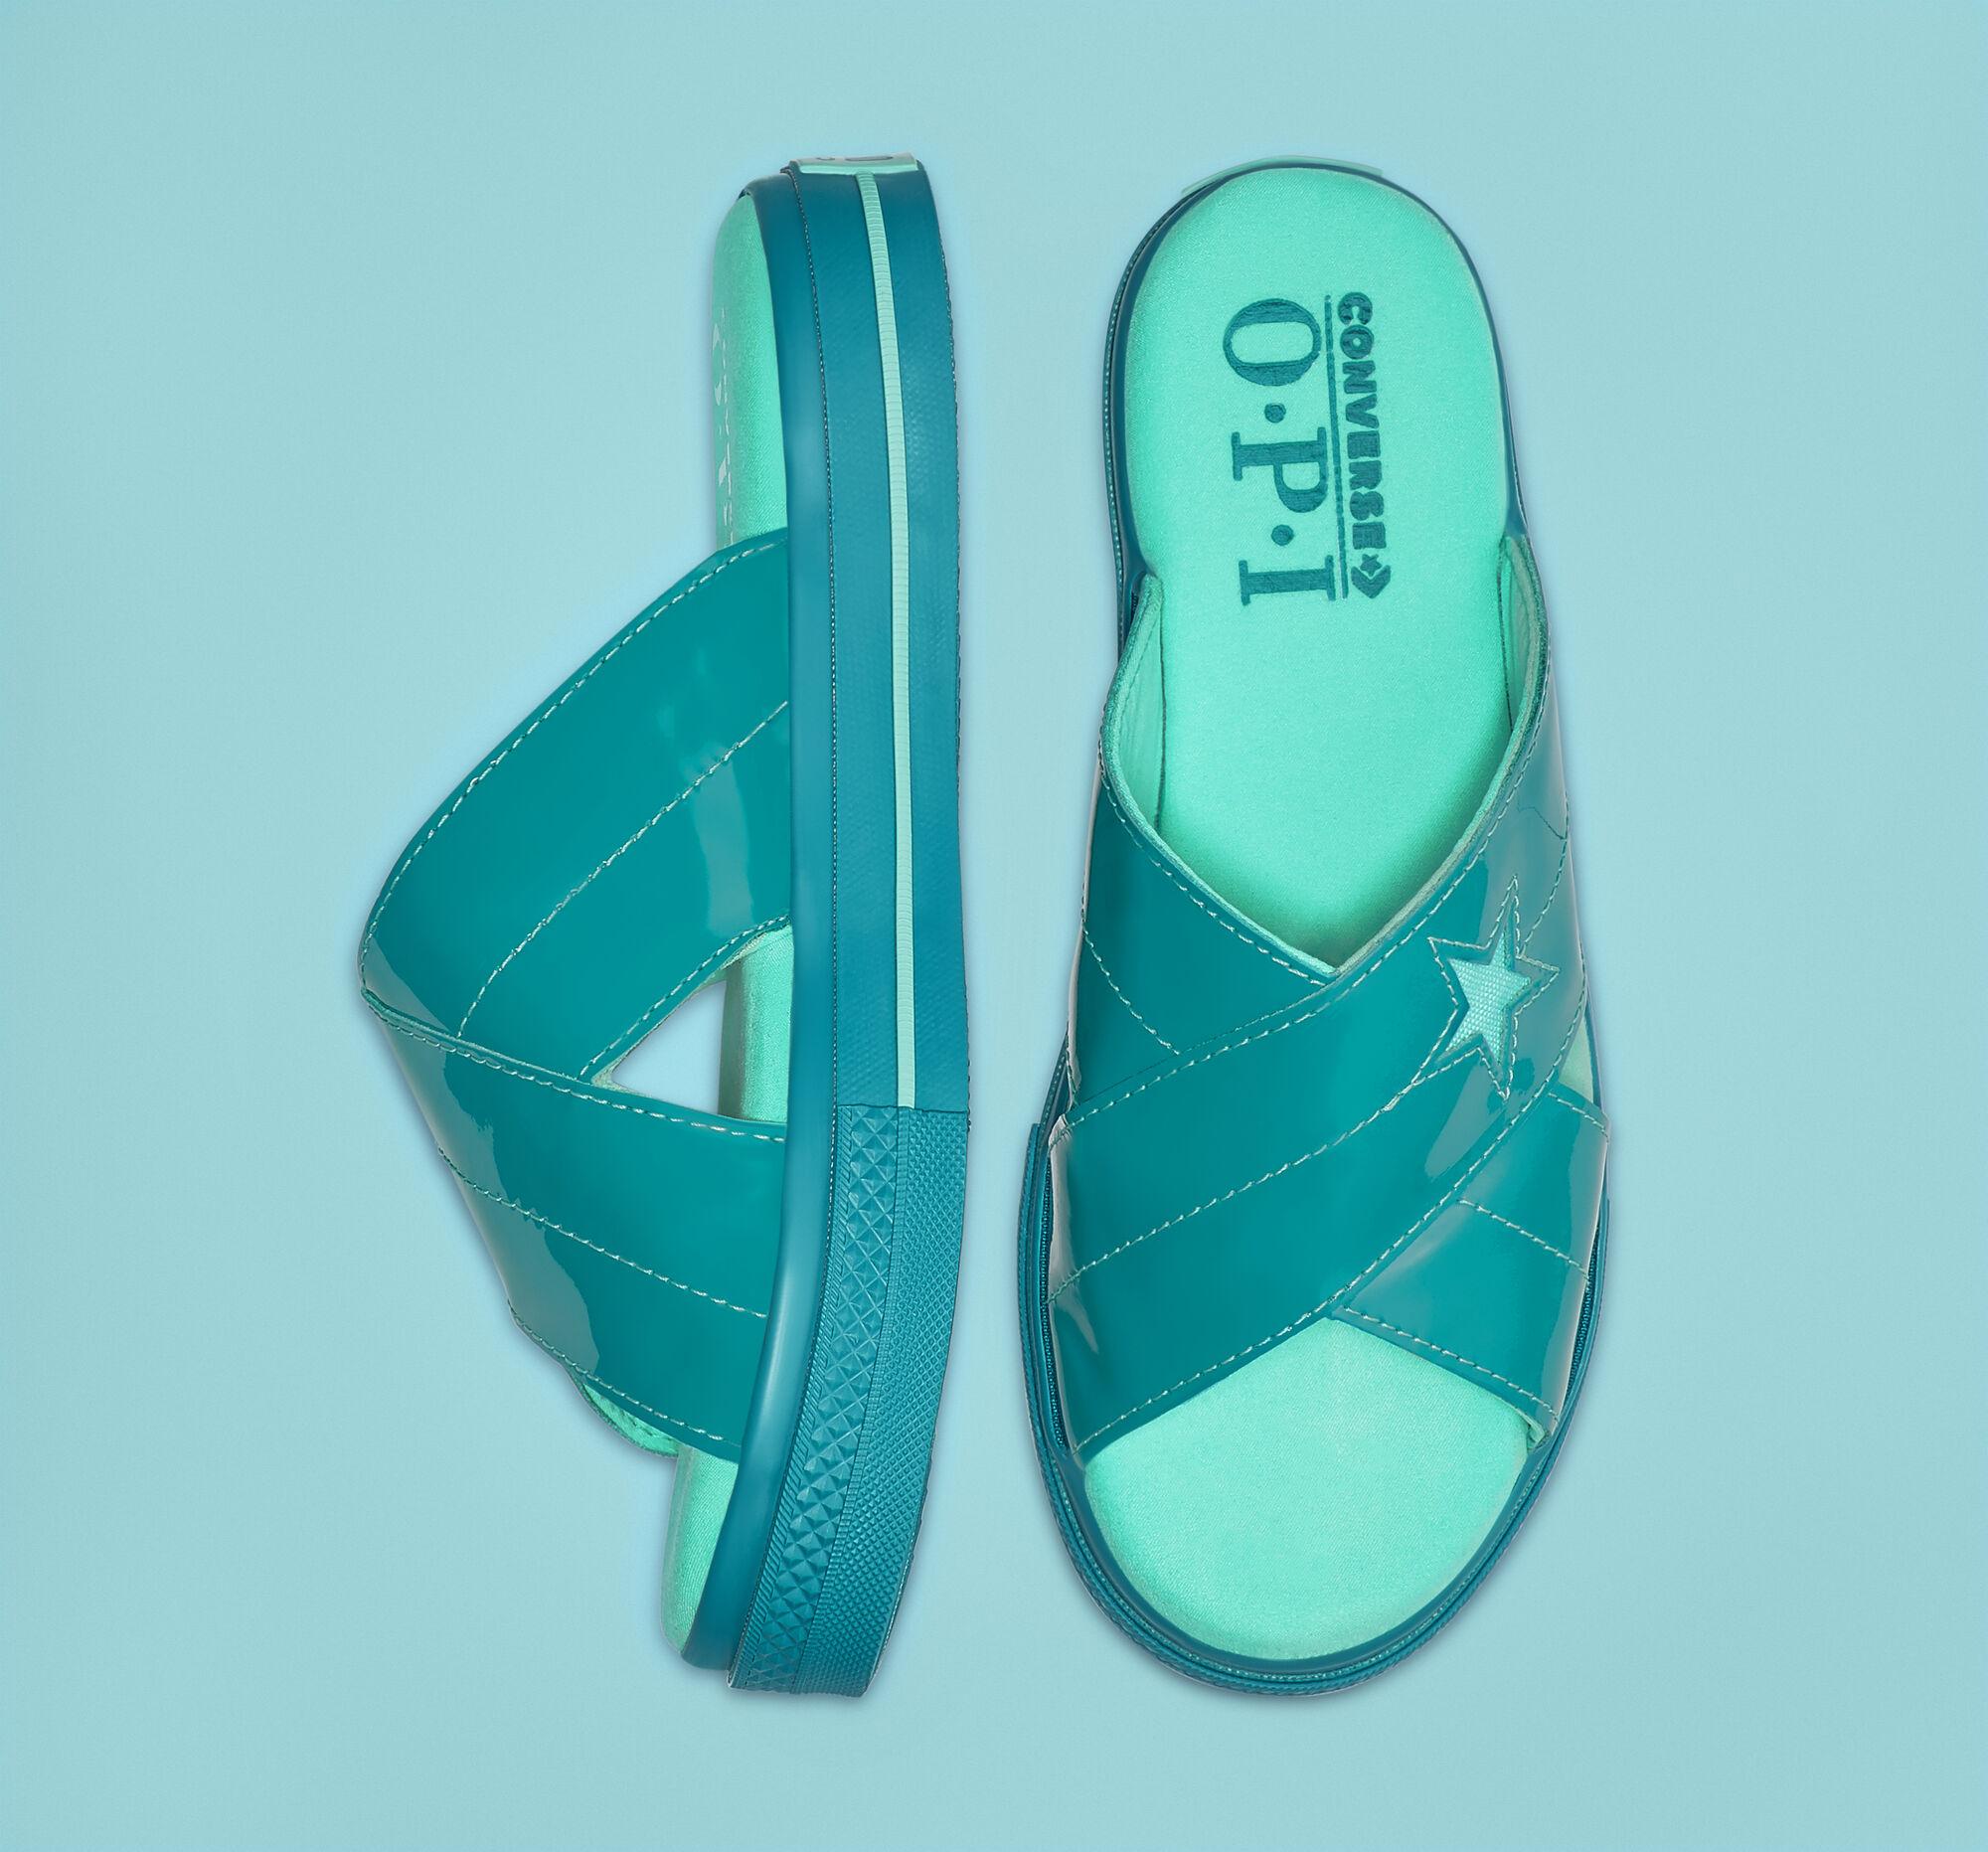 Neon Converse sandals